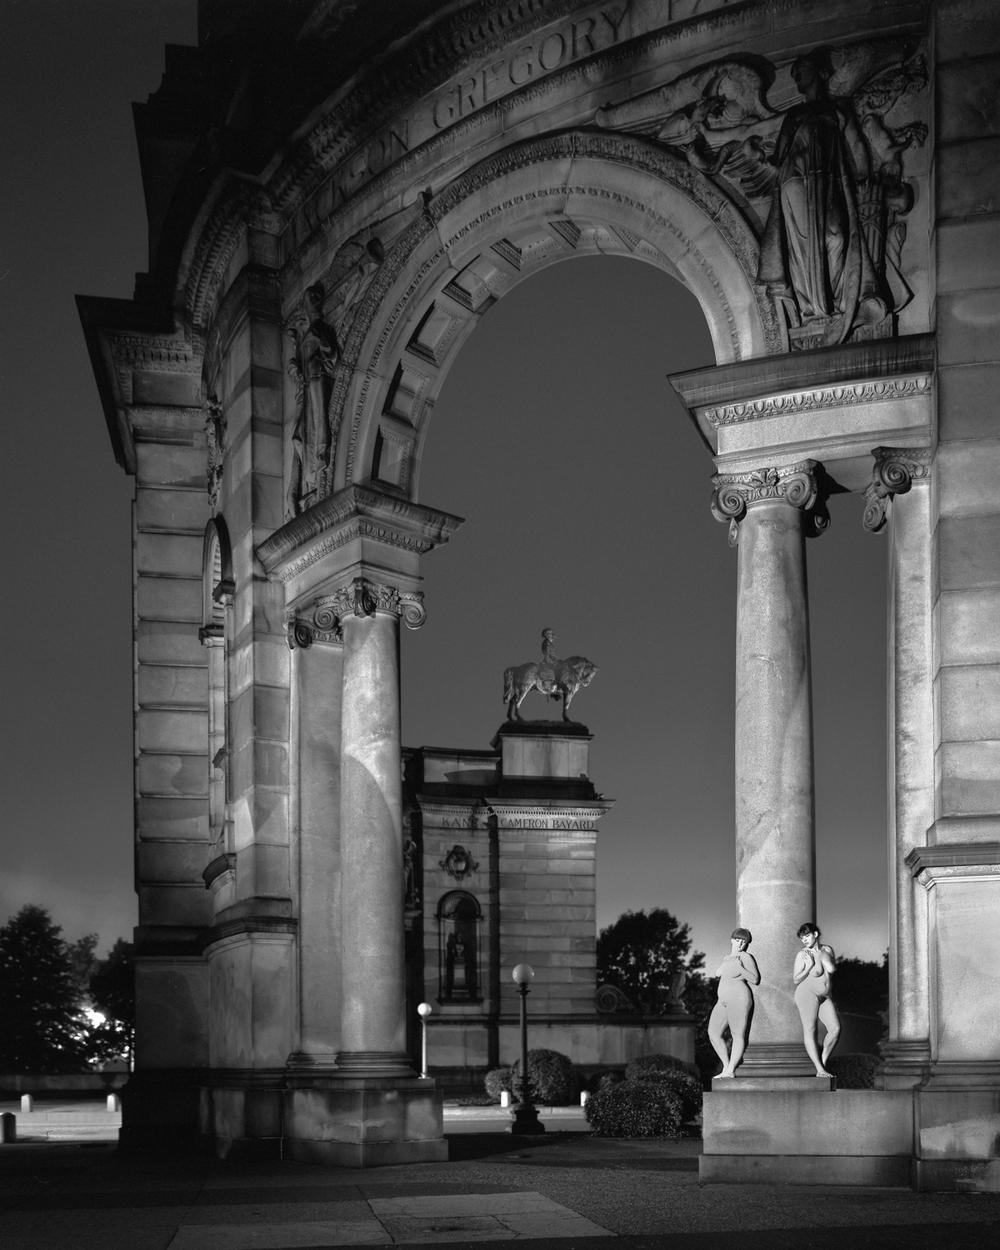 MEMORIAL PARK ARCH, PHILADELPHIA